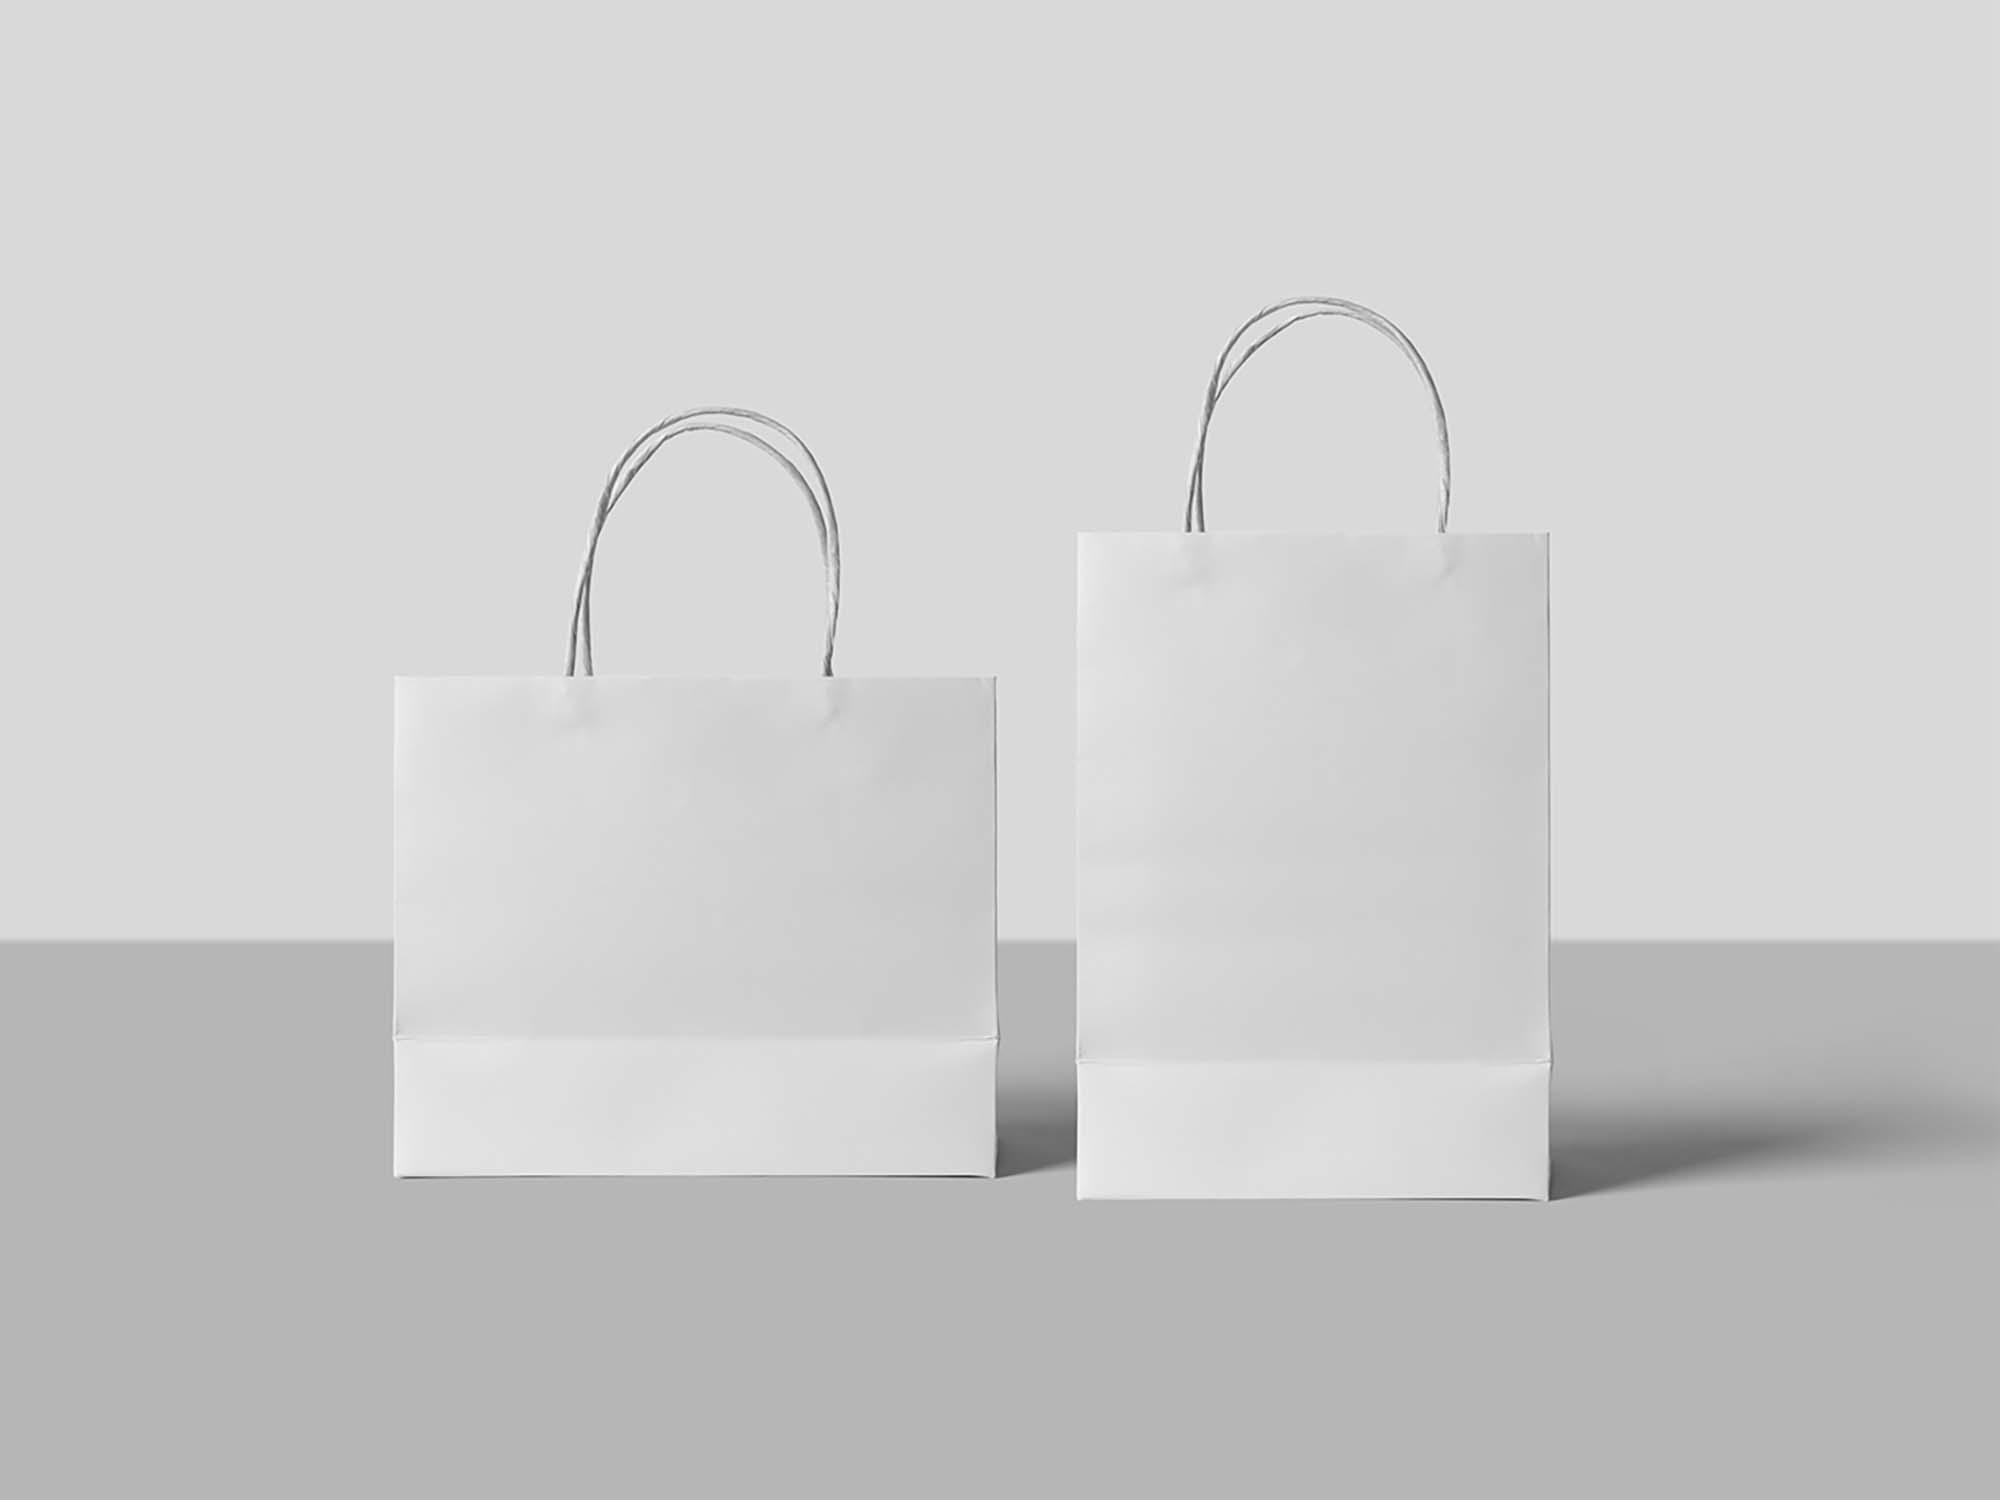 Paper Shopping Bags Mockup 2